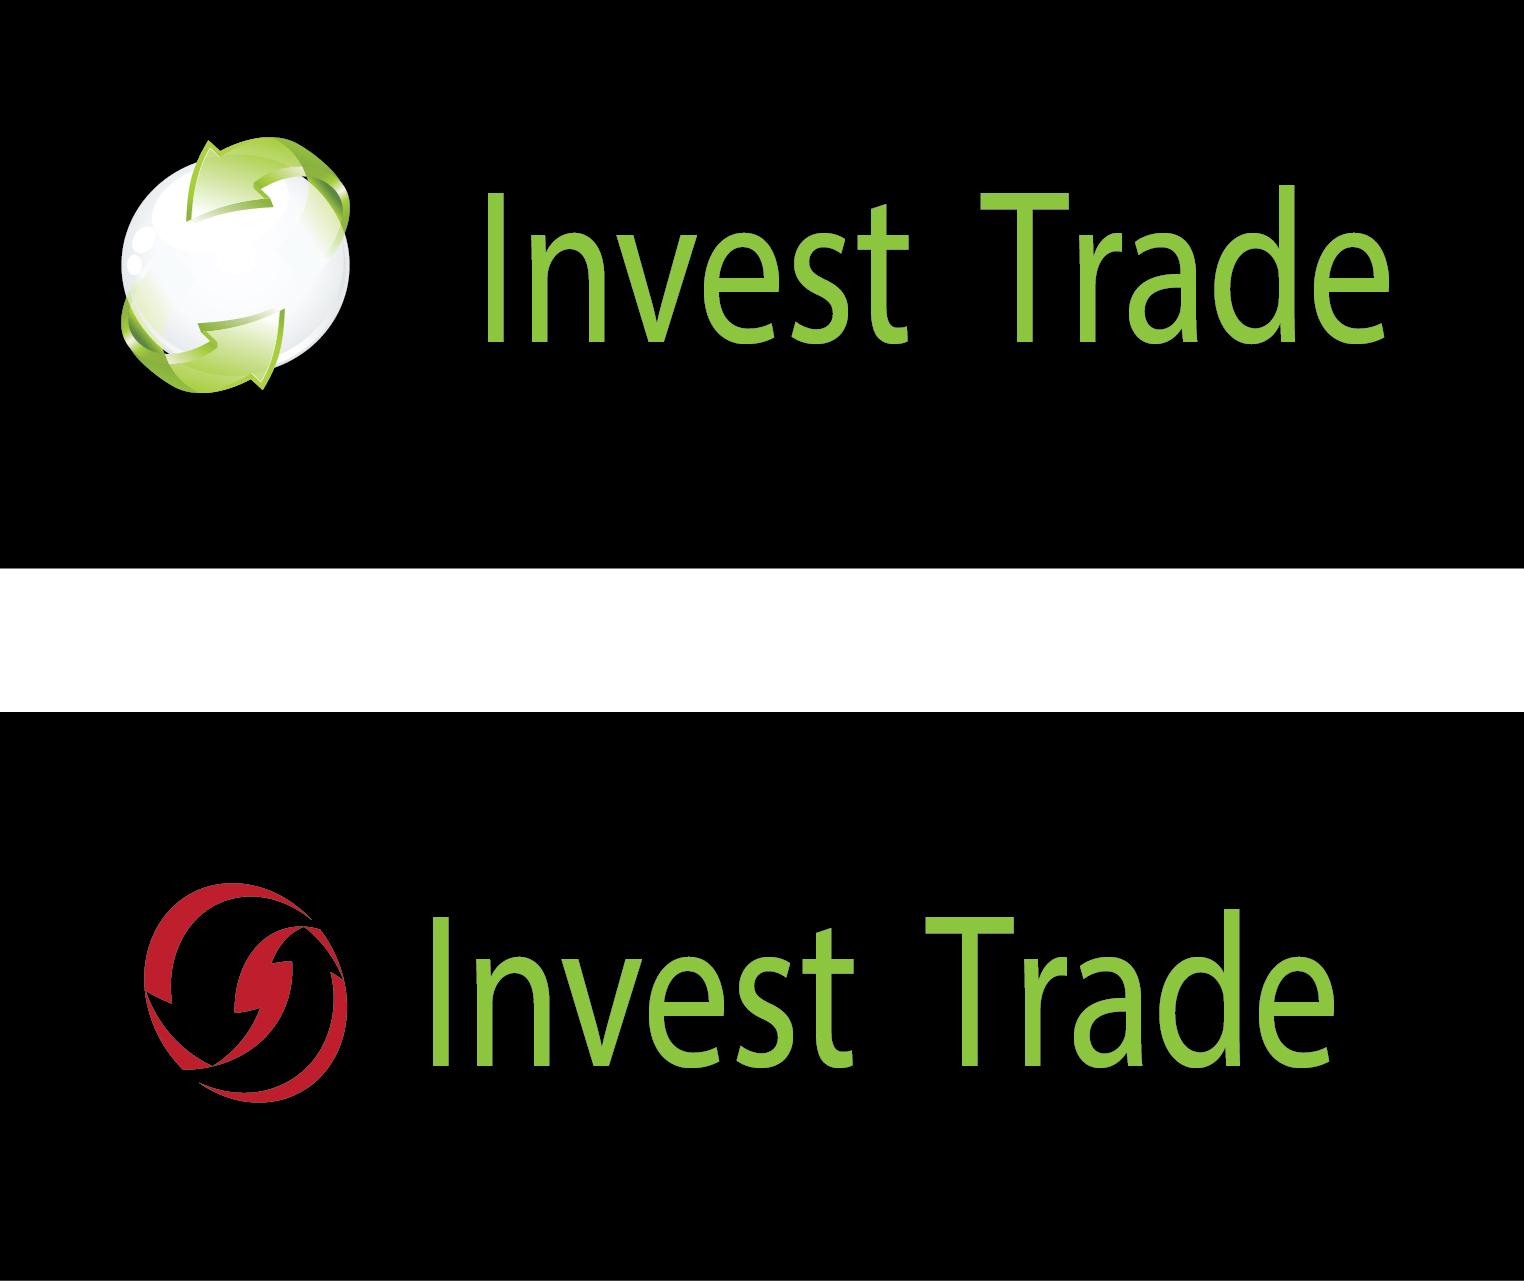 Разработка логотипа для компании Invest trade фото f_4905120f3aedea2c.jpg